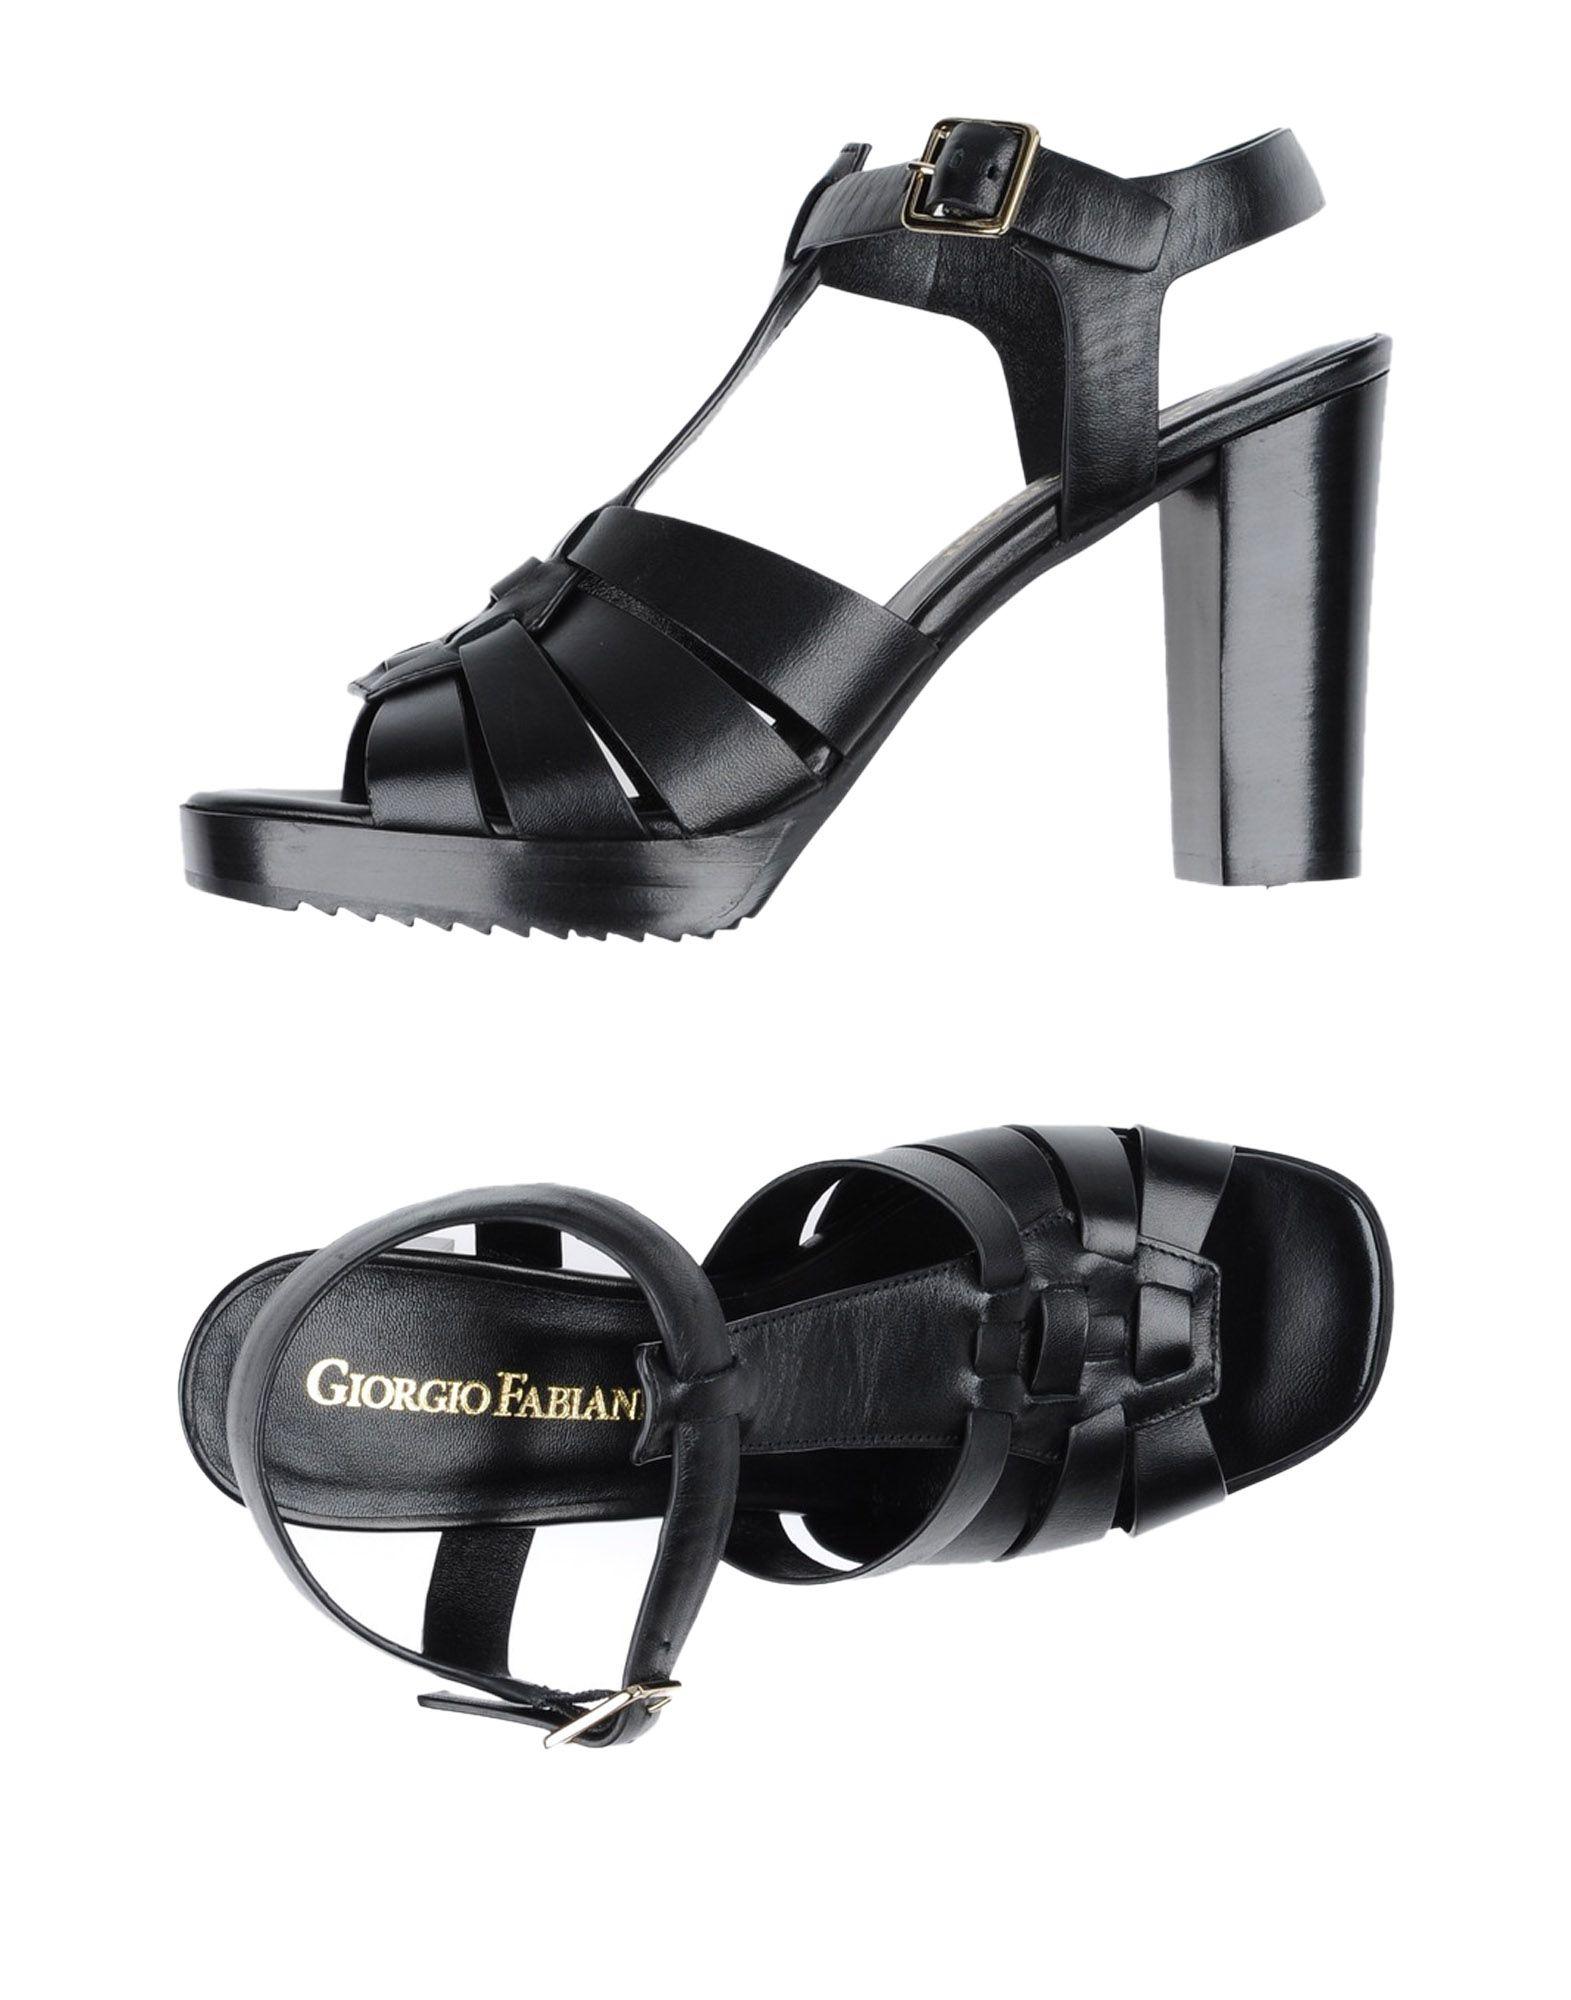 Giorgio Fabiani Sandalen Damen  11332912JJ Gute Qualität beliebte Schuhe